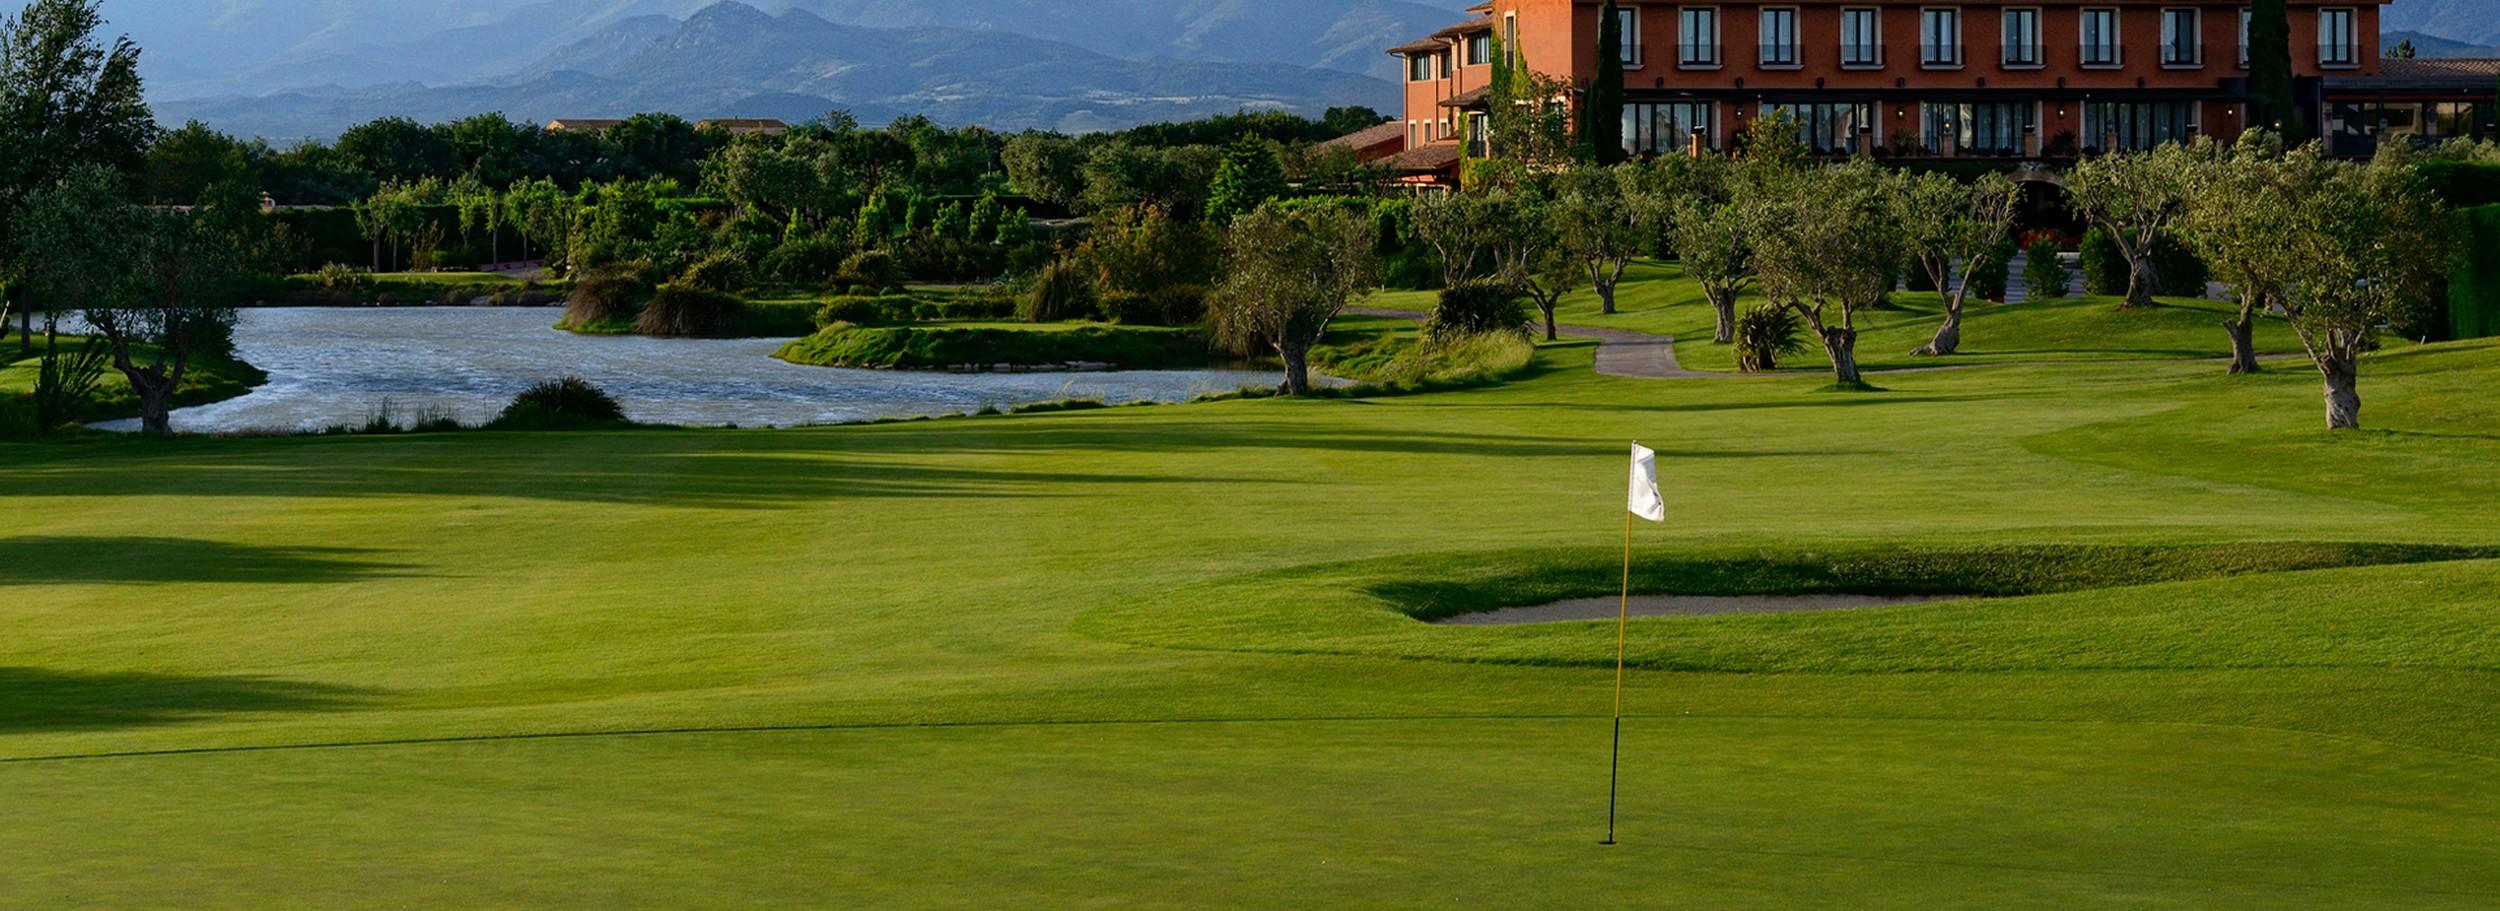 Golf Club Peralada, Spain